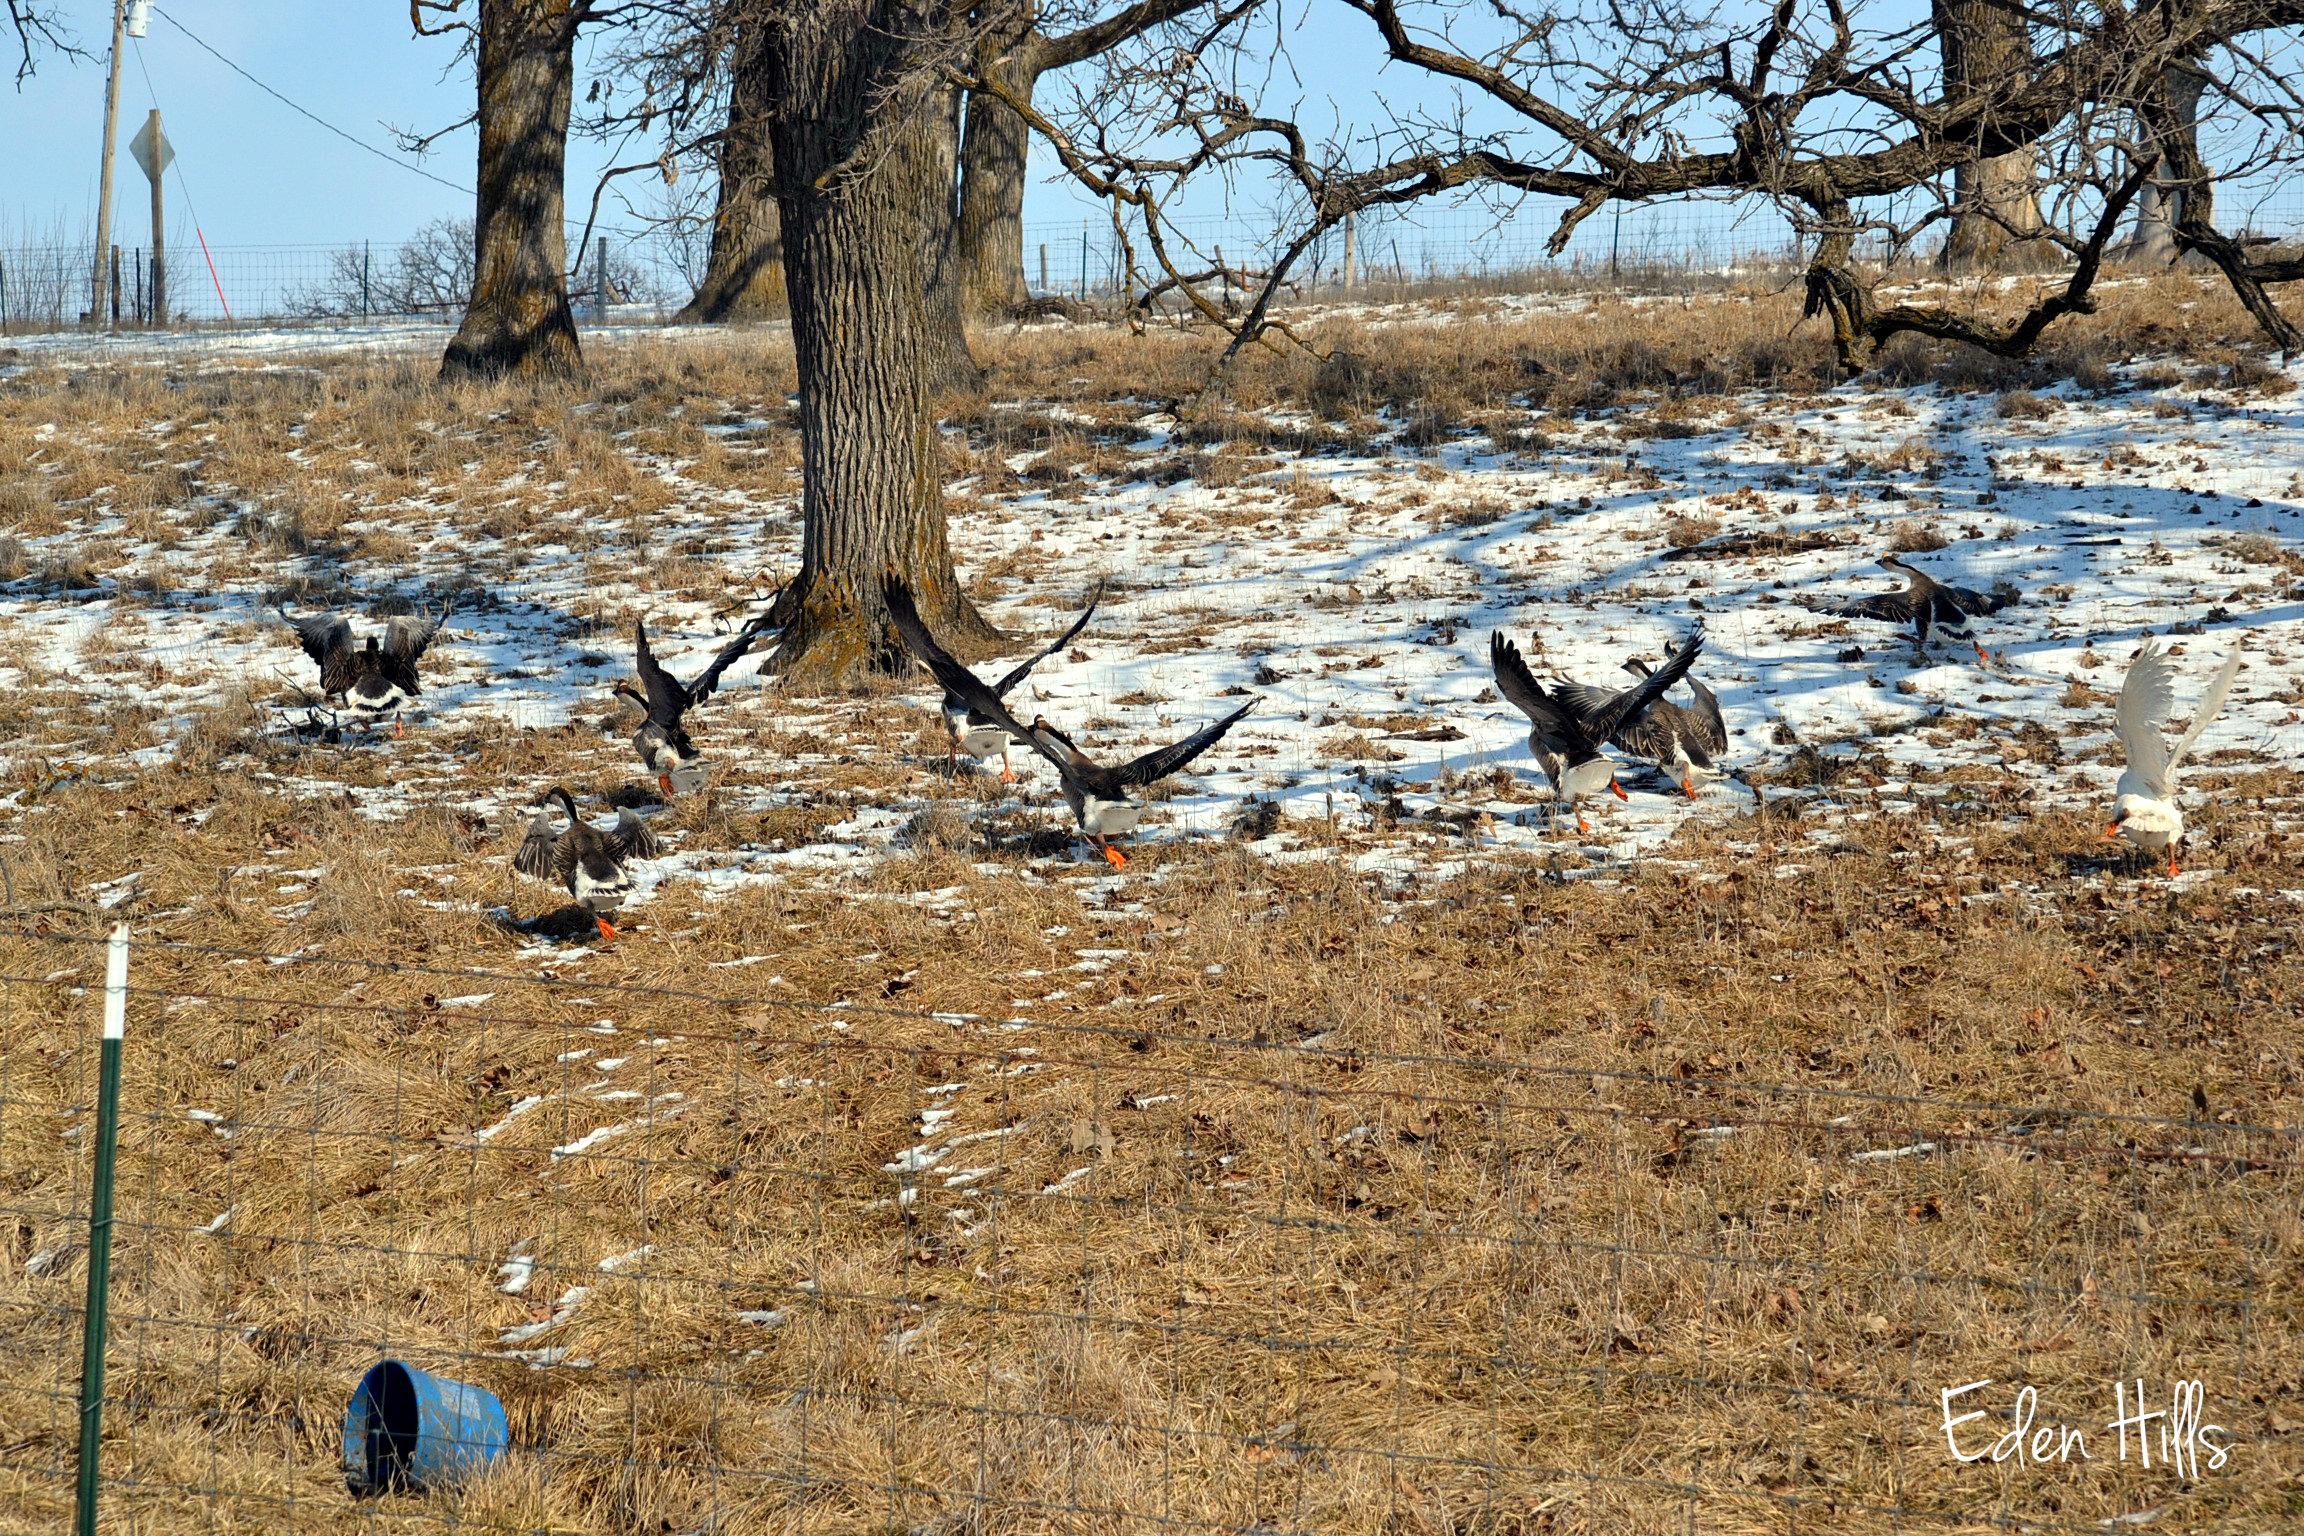 The geese in pasture eden hills for Eden hill walk in